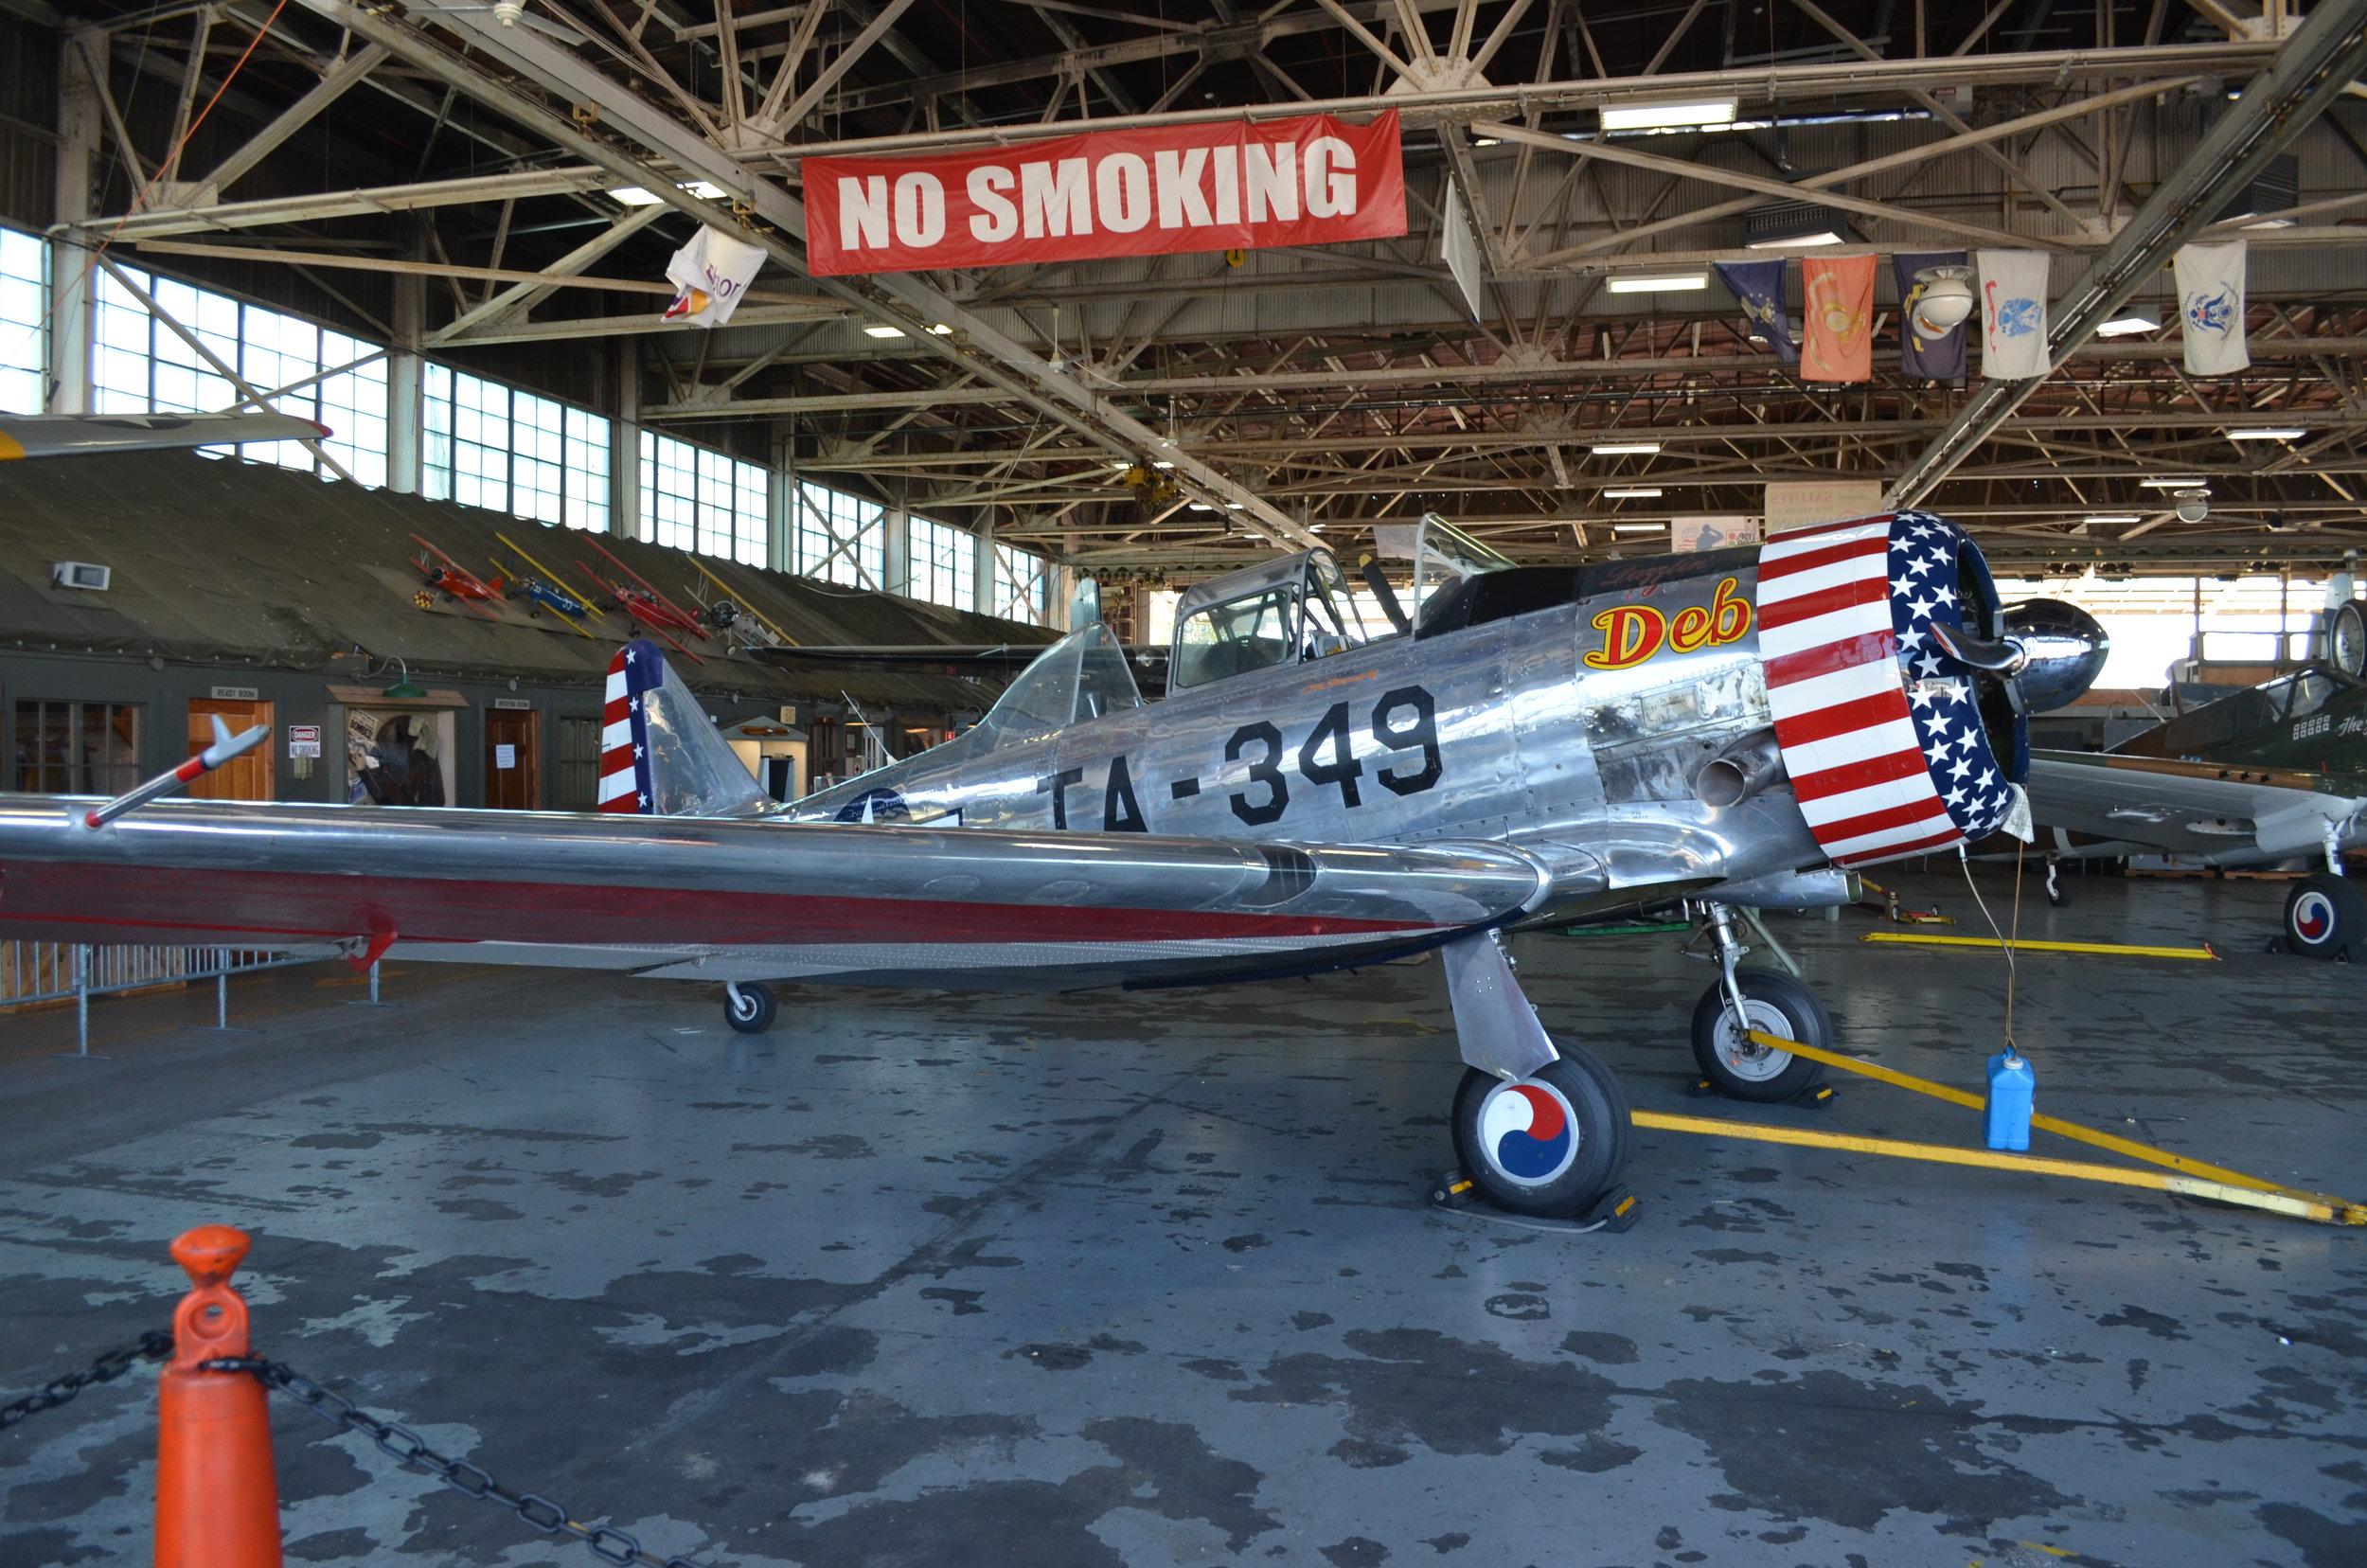 2016 Annual Picnic - American Airpower Museum, Farmingdale